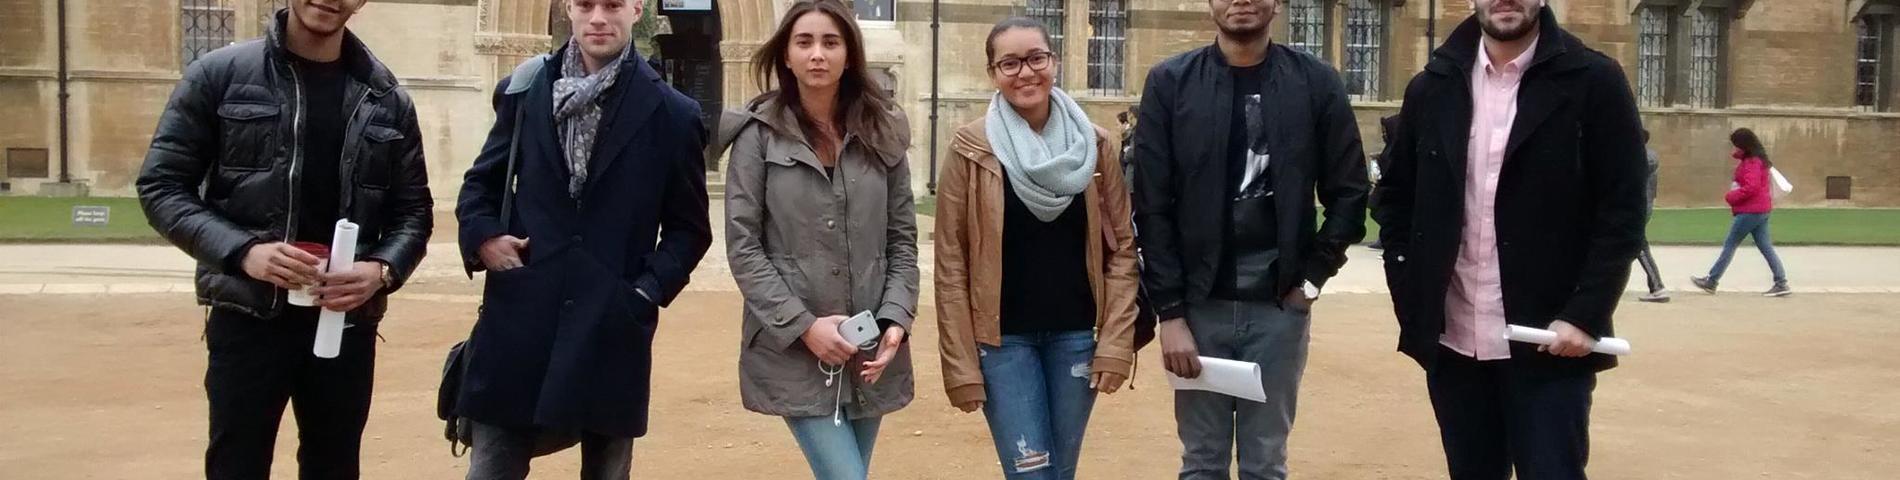 Oxford International Study Centre obrazek 1